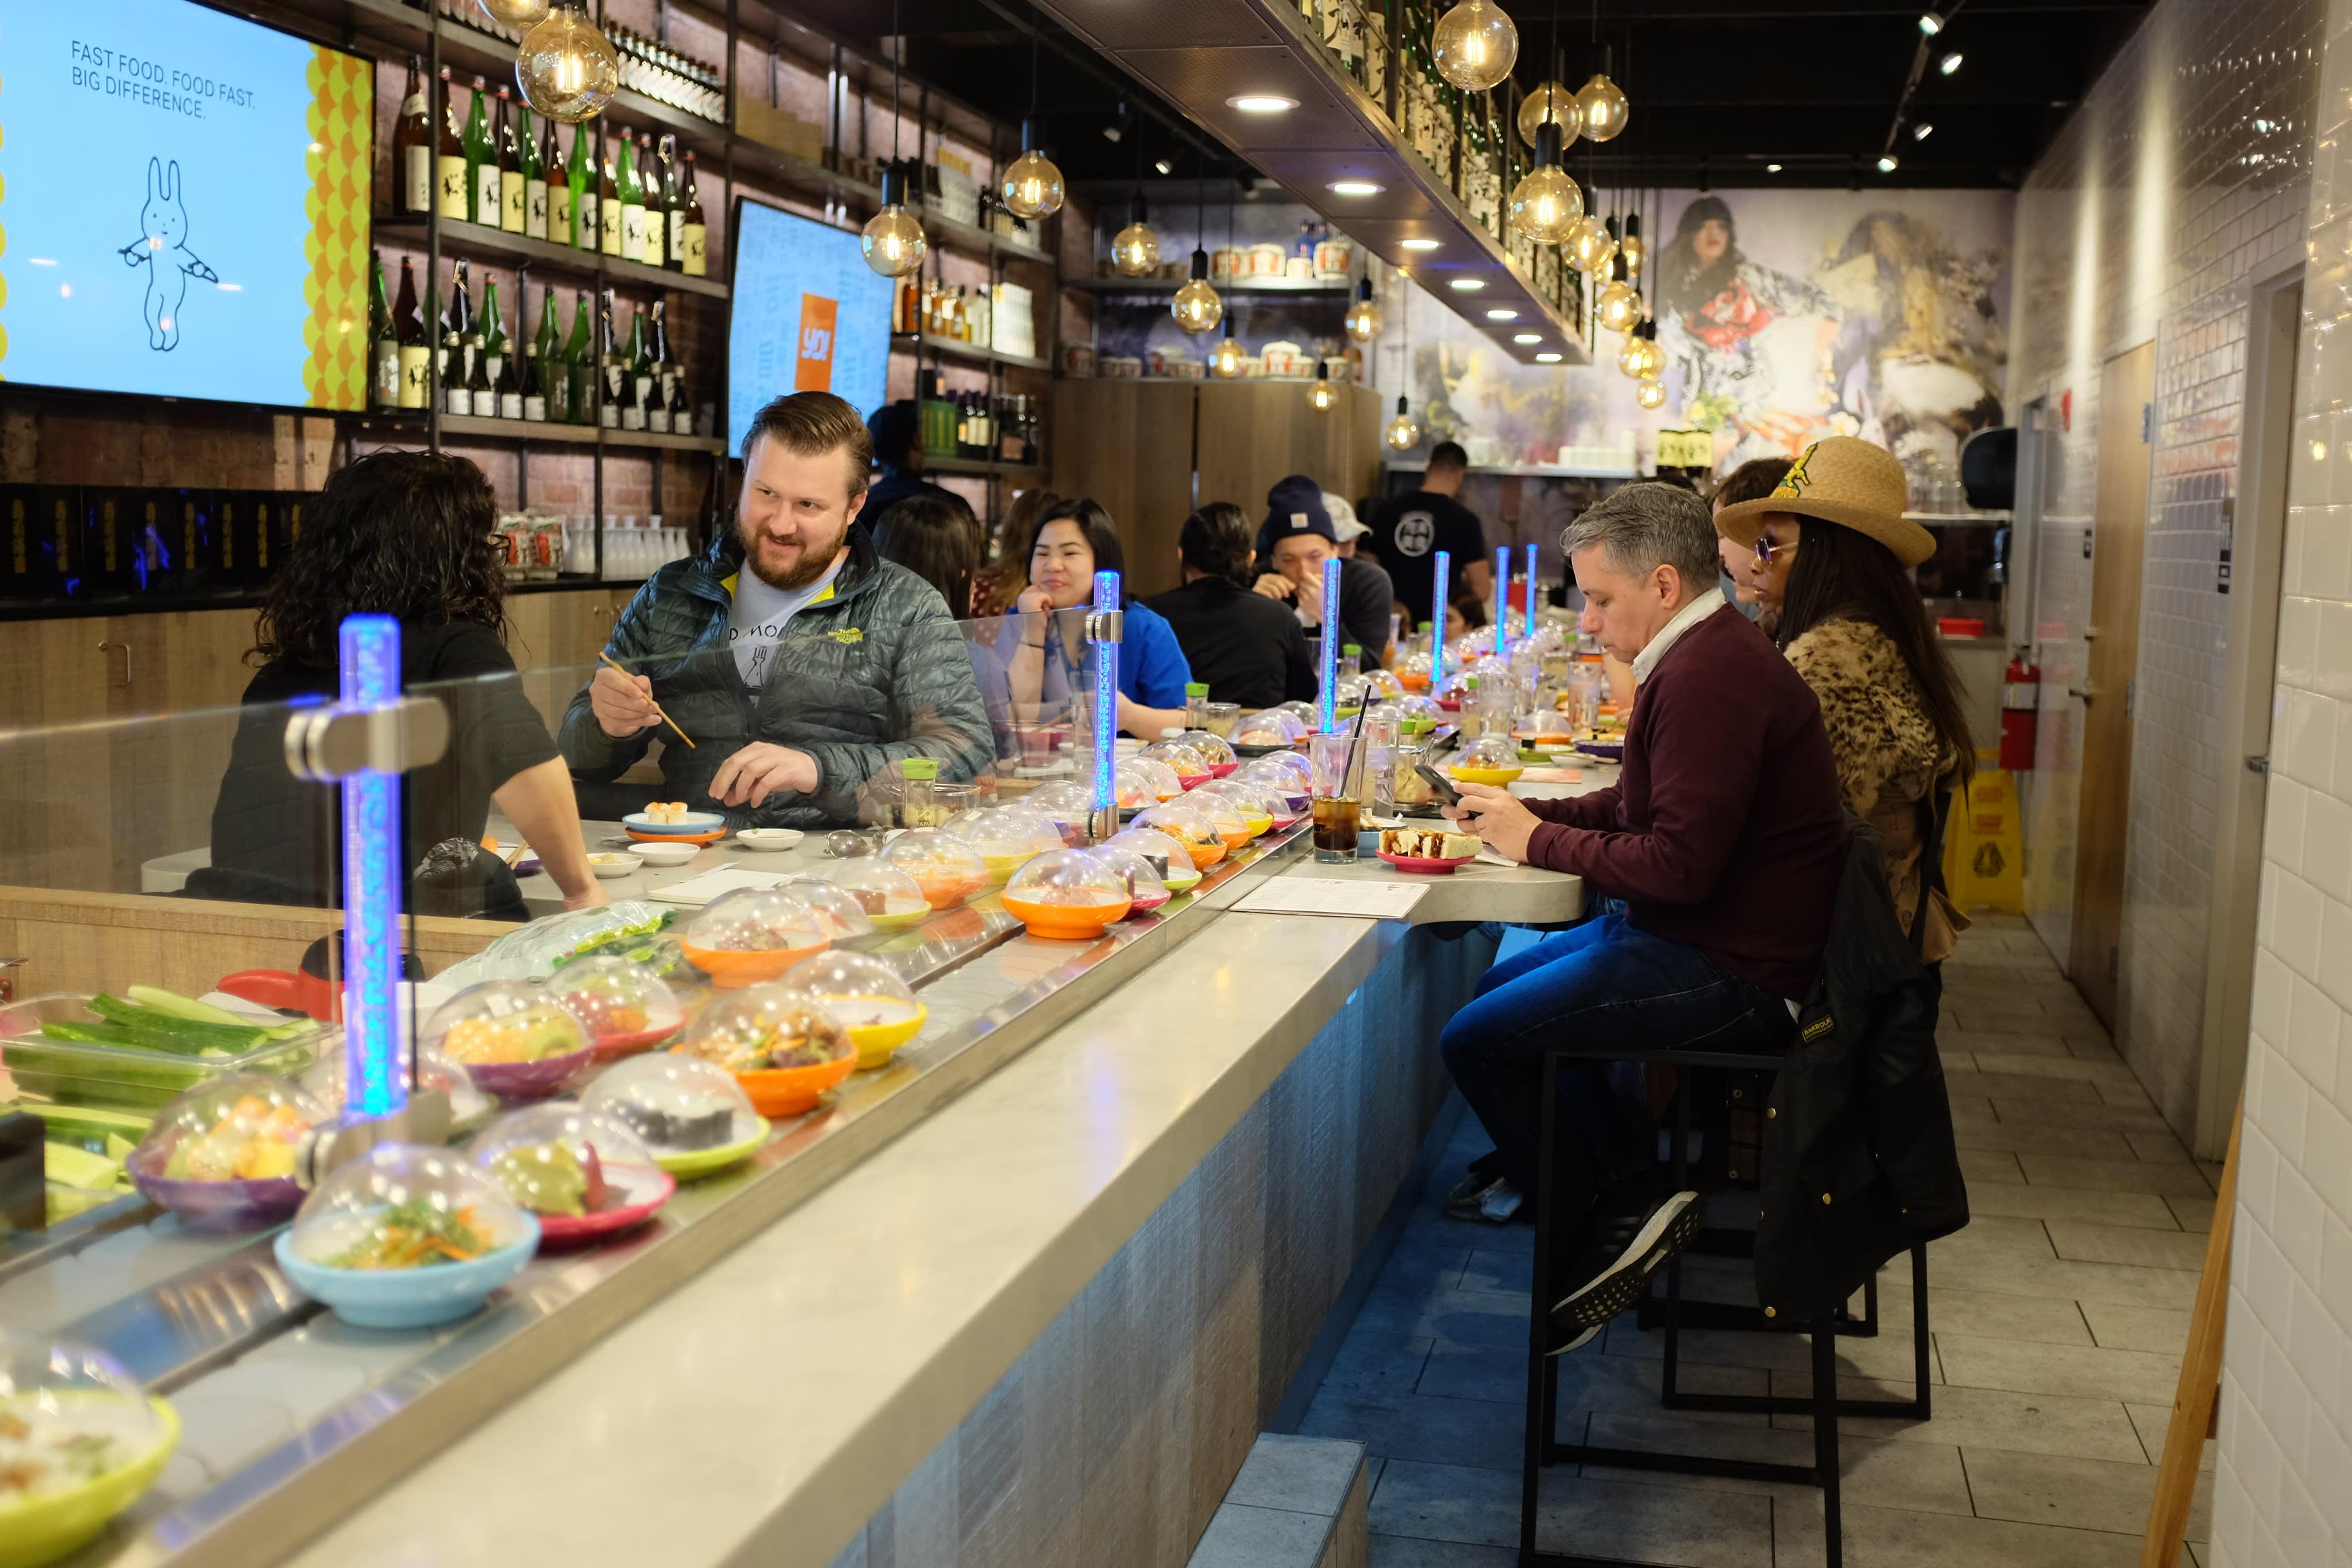 Conveyor-belt sushi rolls again in New York - Nikkei Asian Review